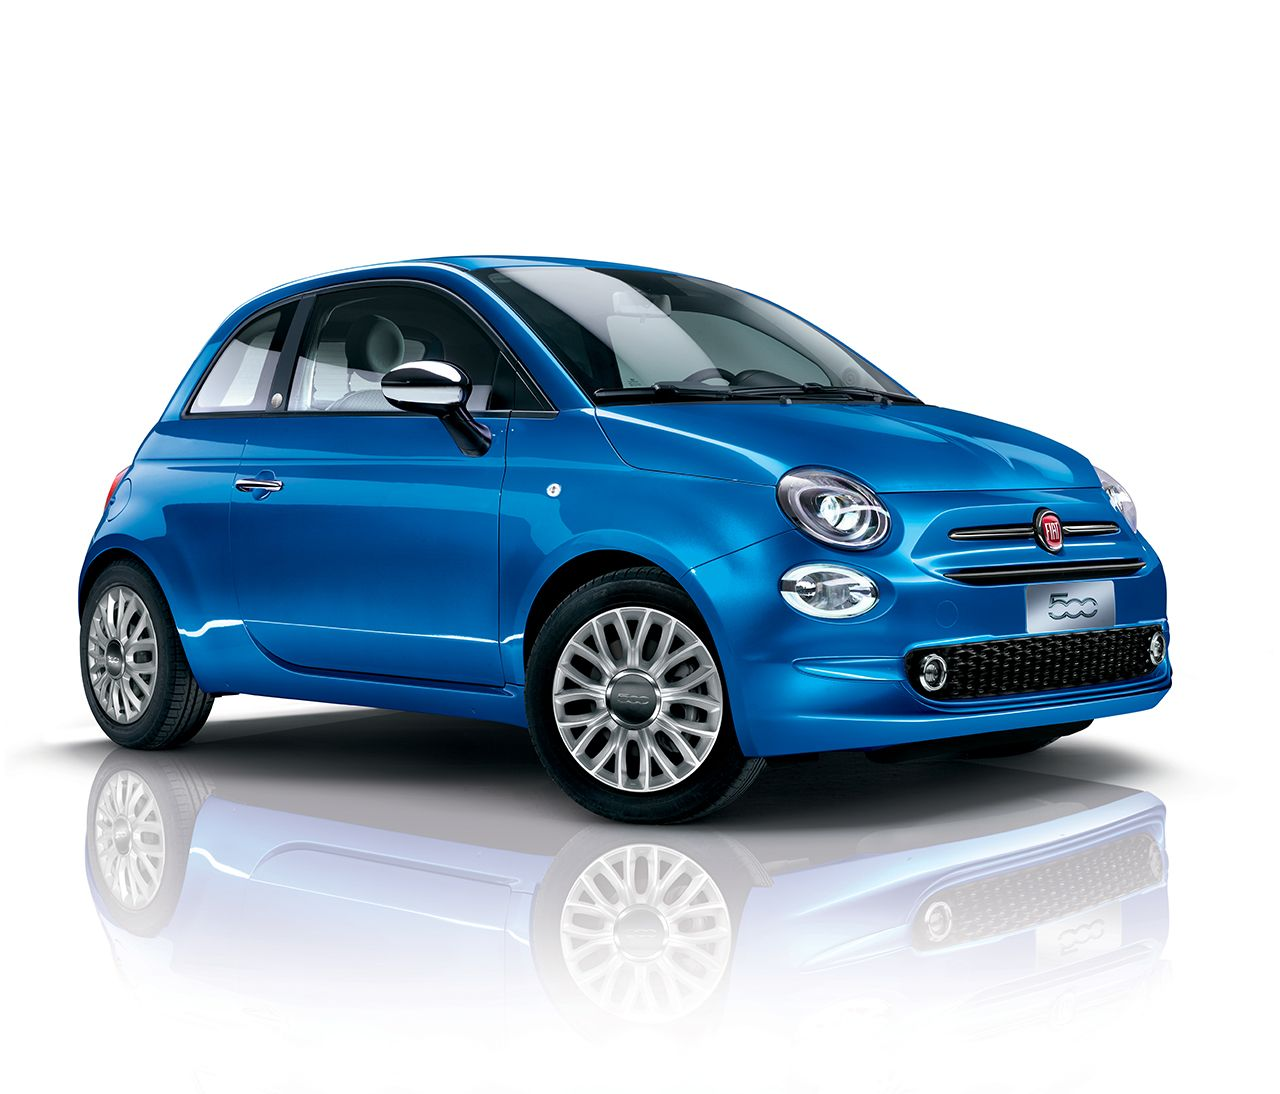 170331 Fiat Mirror 012B252812529 Το Fiat 500 γιορτάζει τα 60ά γενέθλιά του προσφέροντας μοναδικά δώρα 500, Fiat, Fiat 500, videos